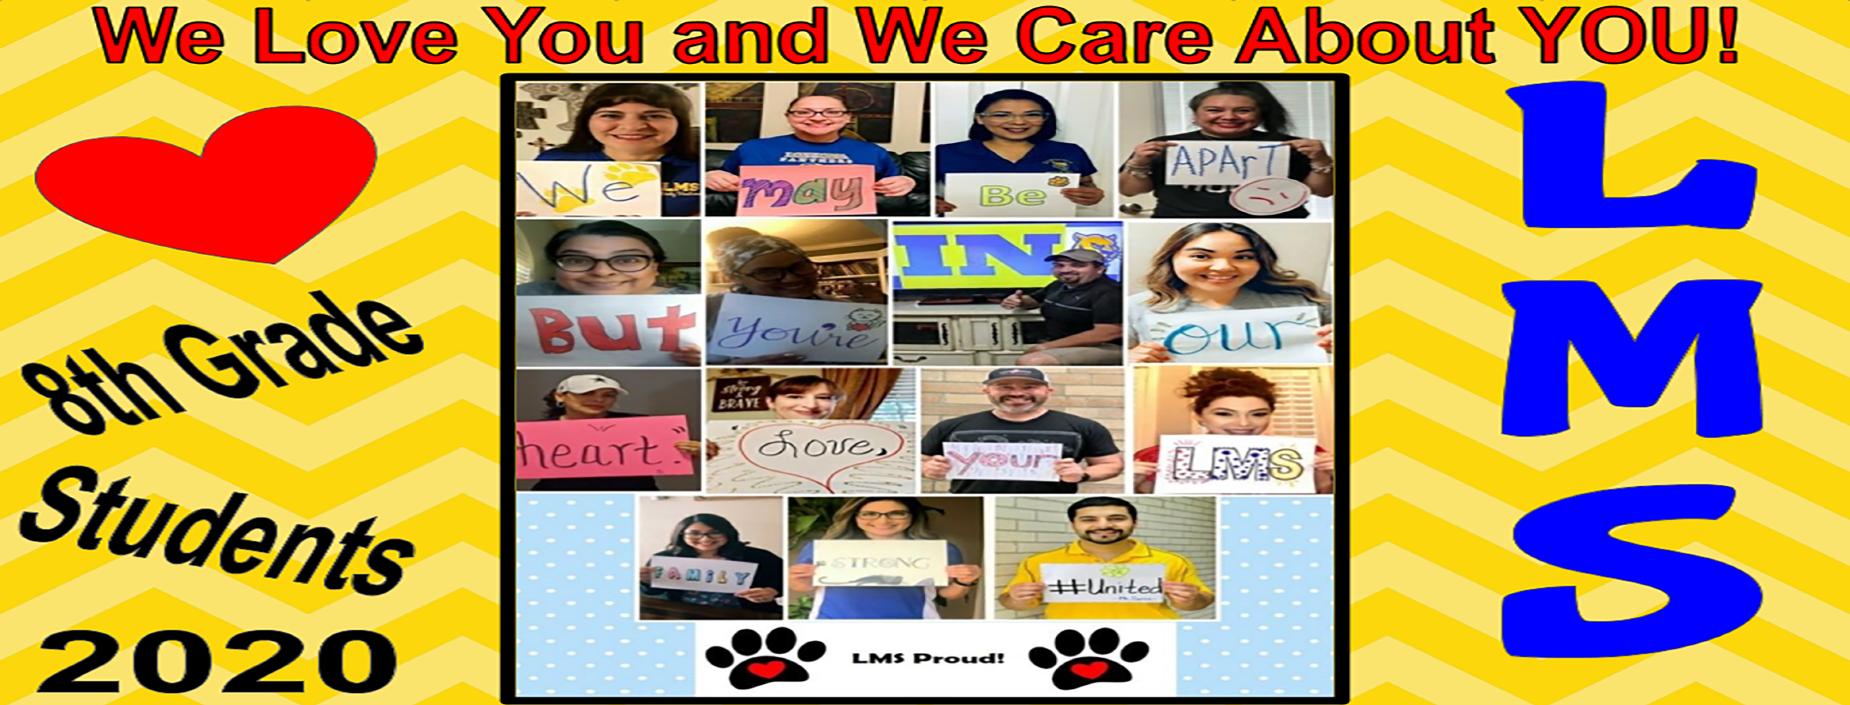 LMS Teachers Care